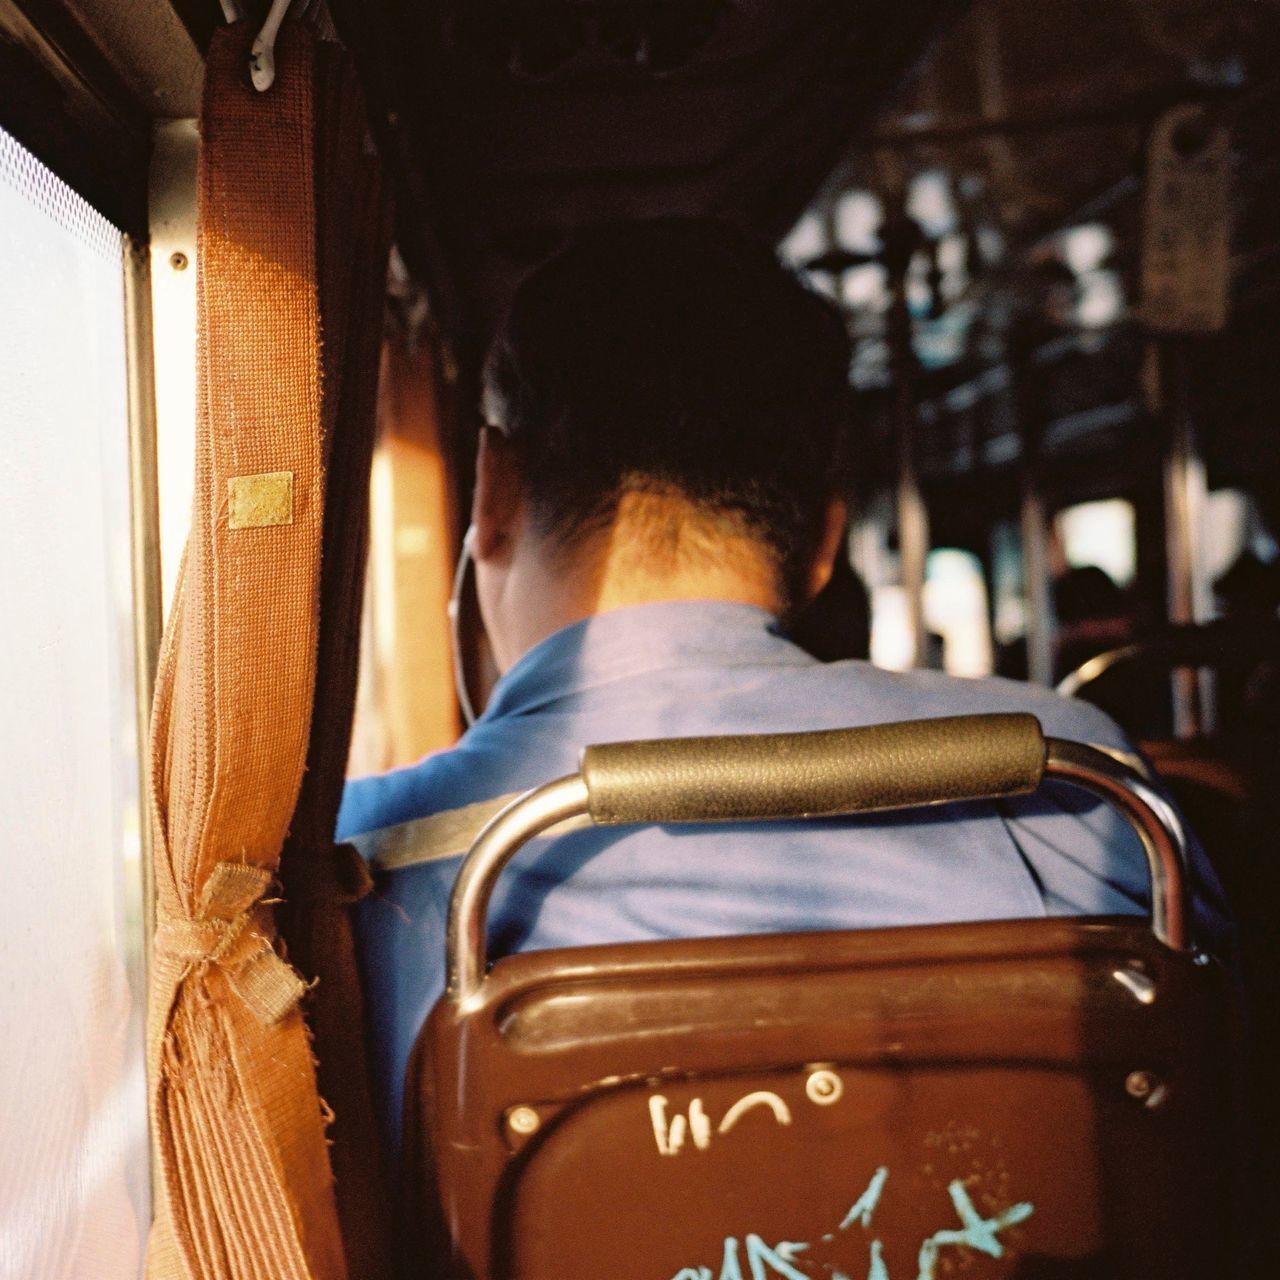 My Commute EyeEm X Mashable - My Commute